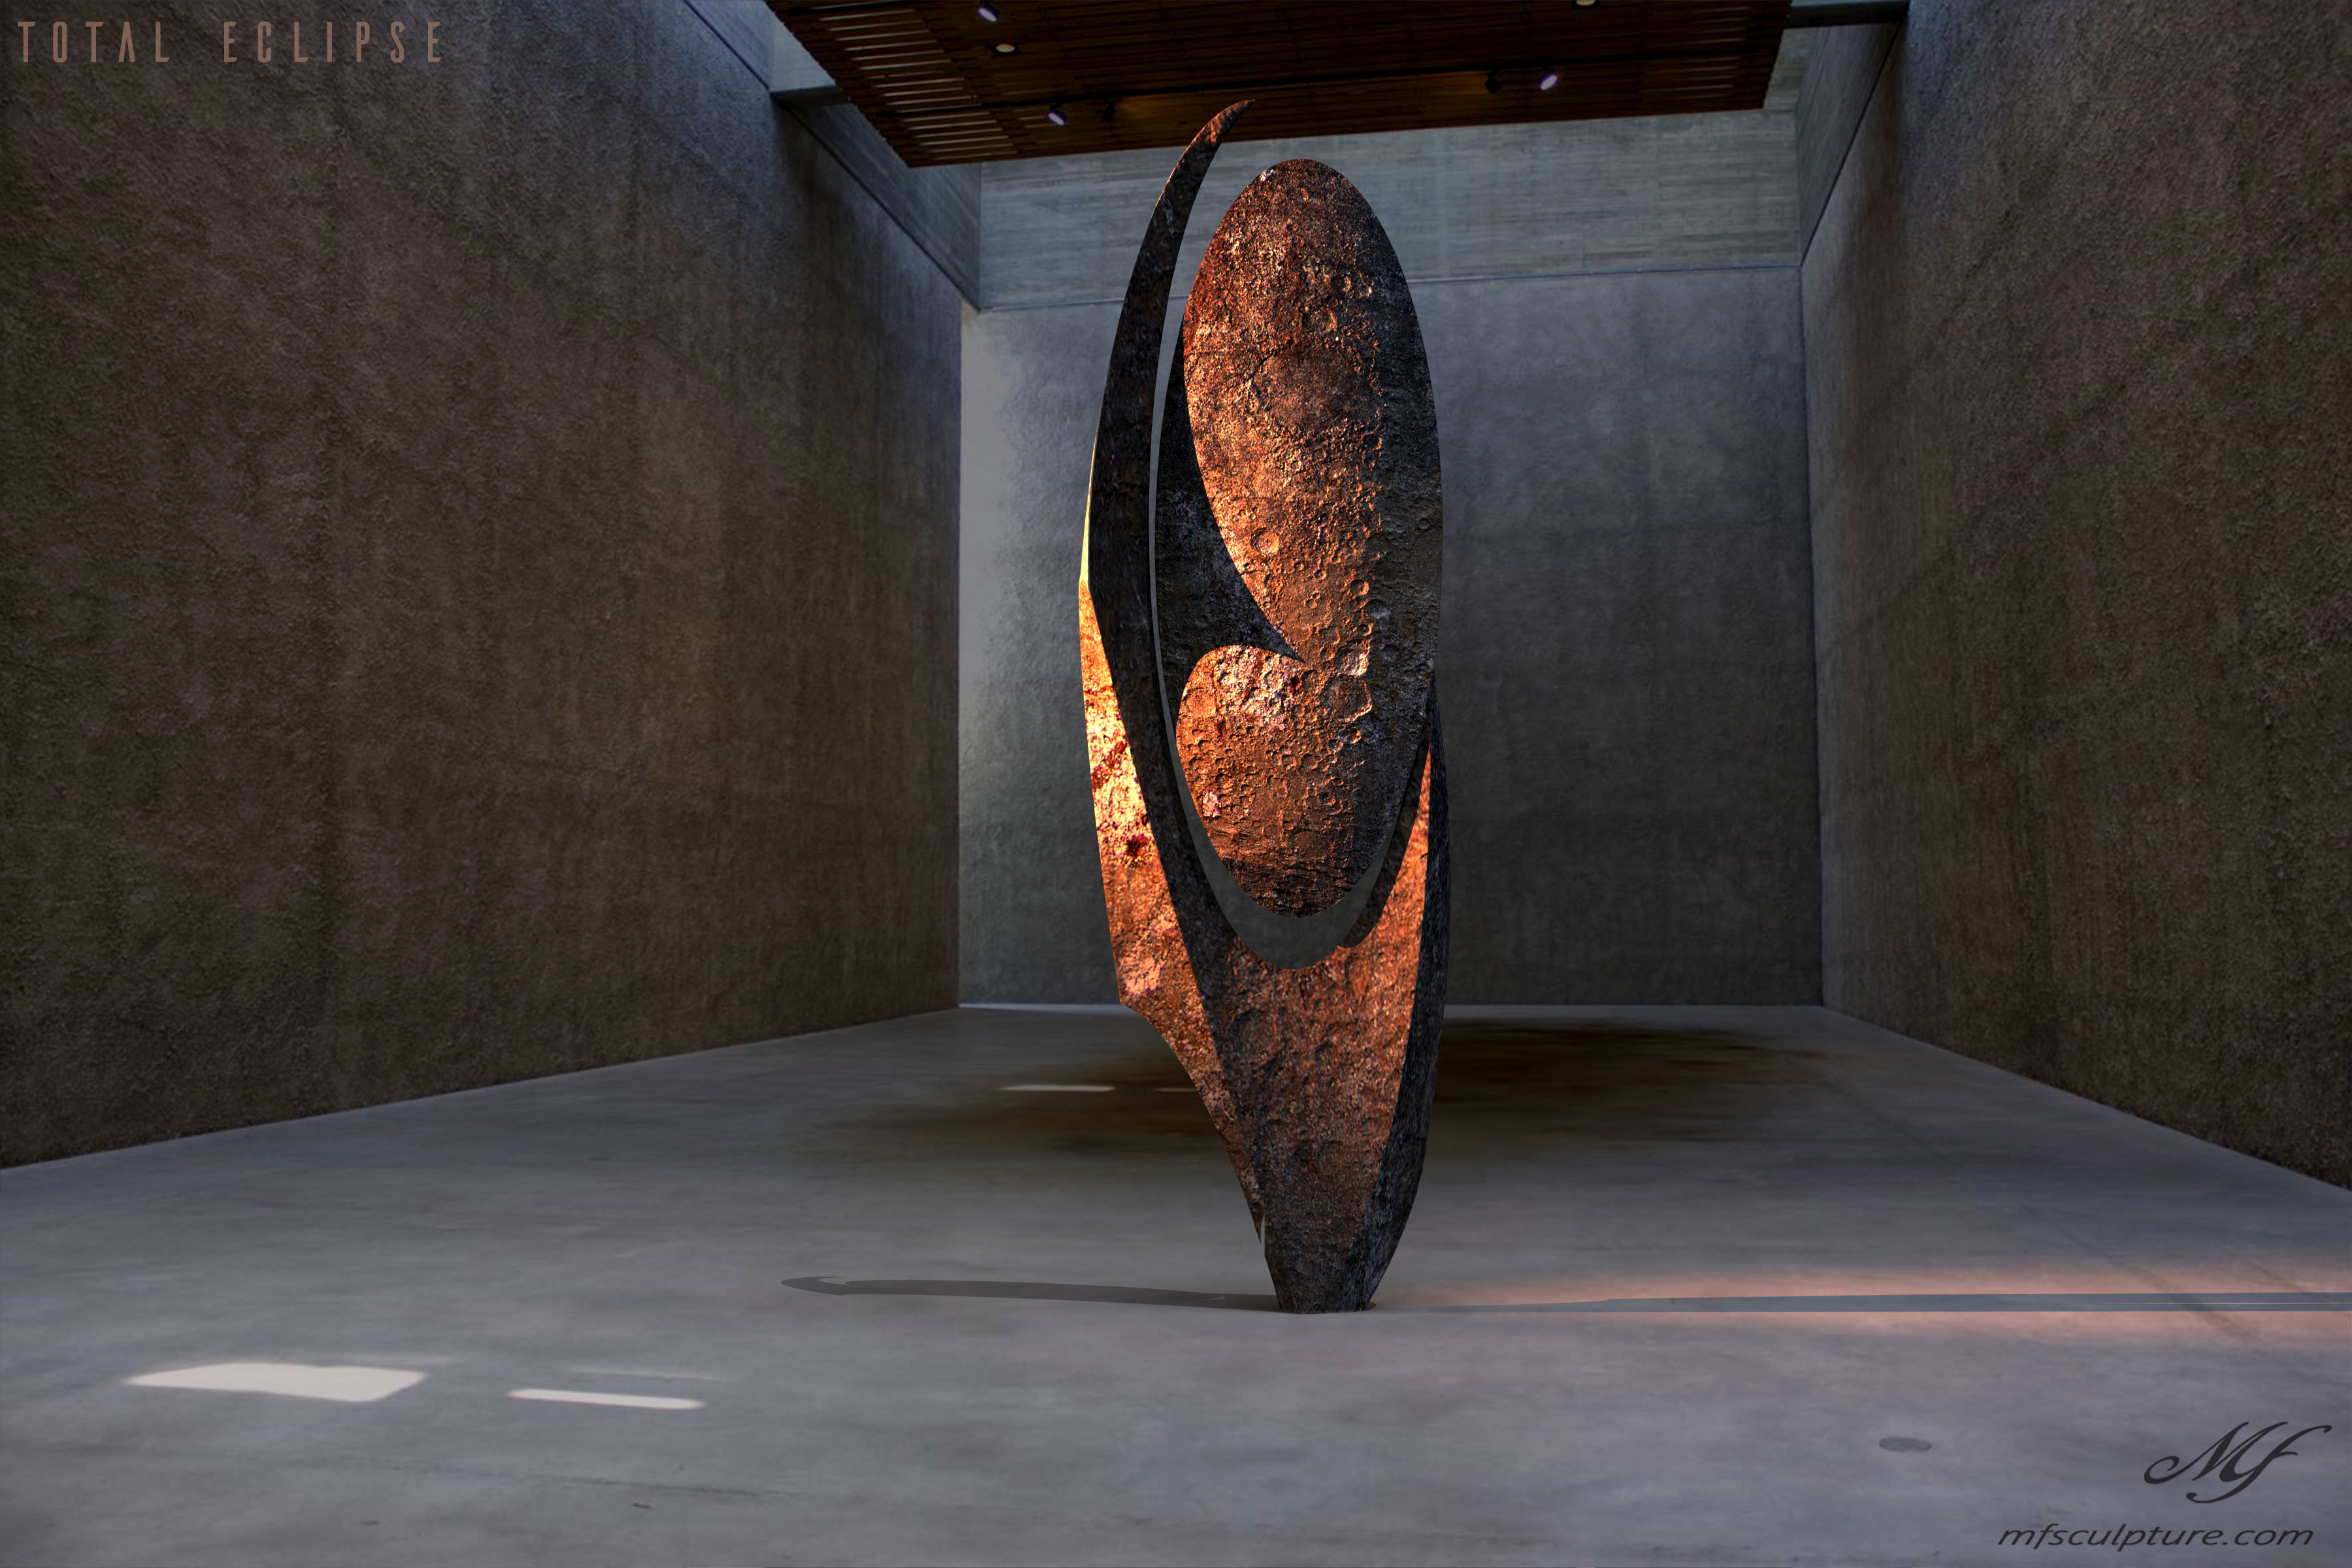 Konig Galerie Koenig Gallery Contemporary Sculpture Art Total Eclipse Moon 1